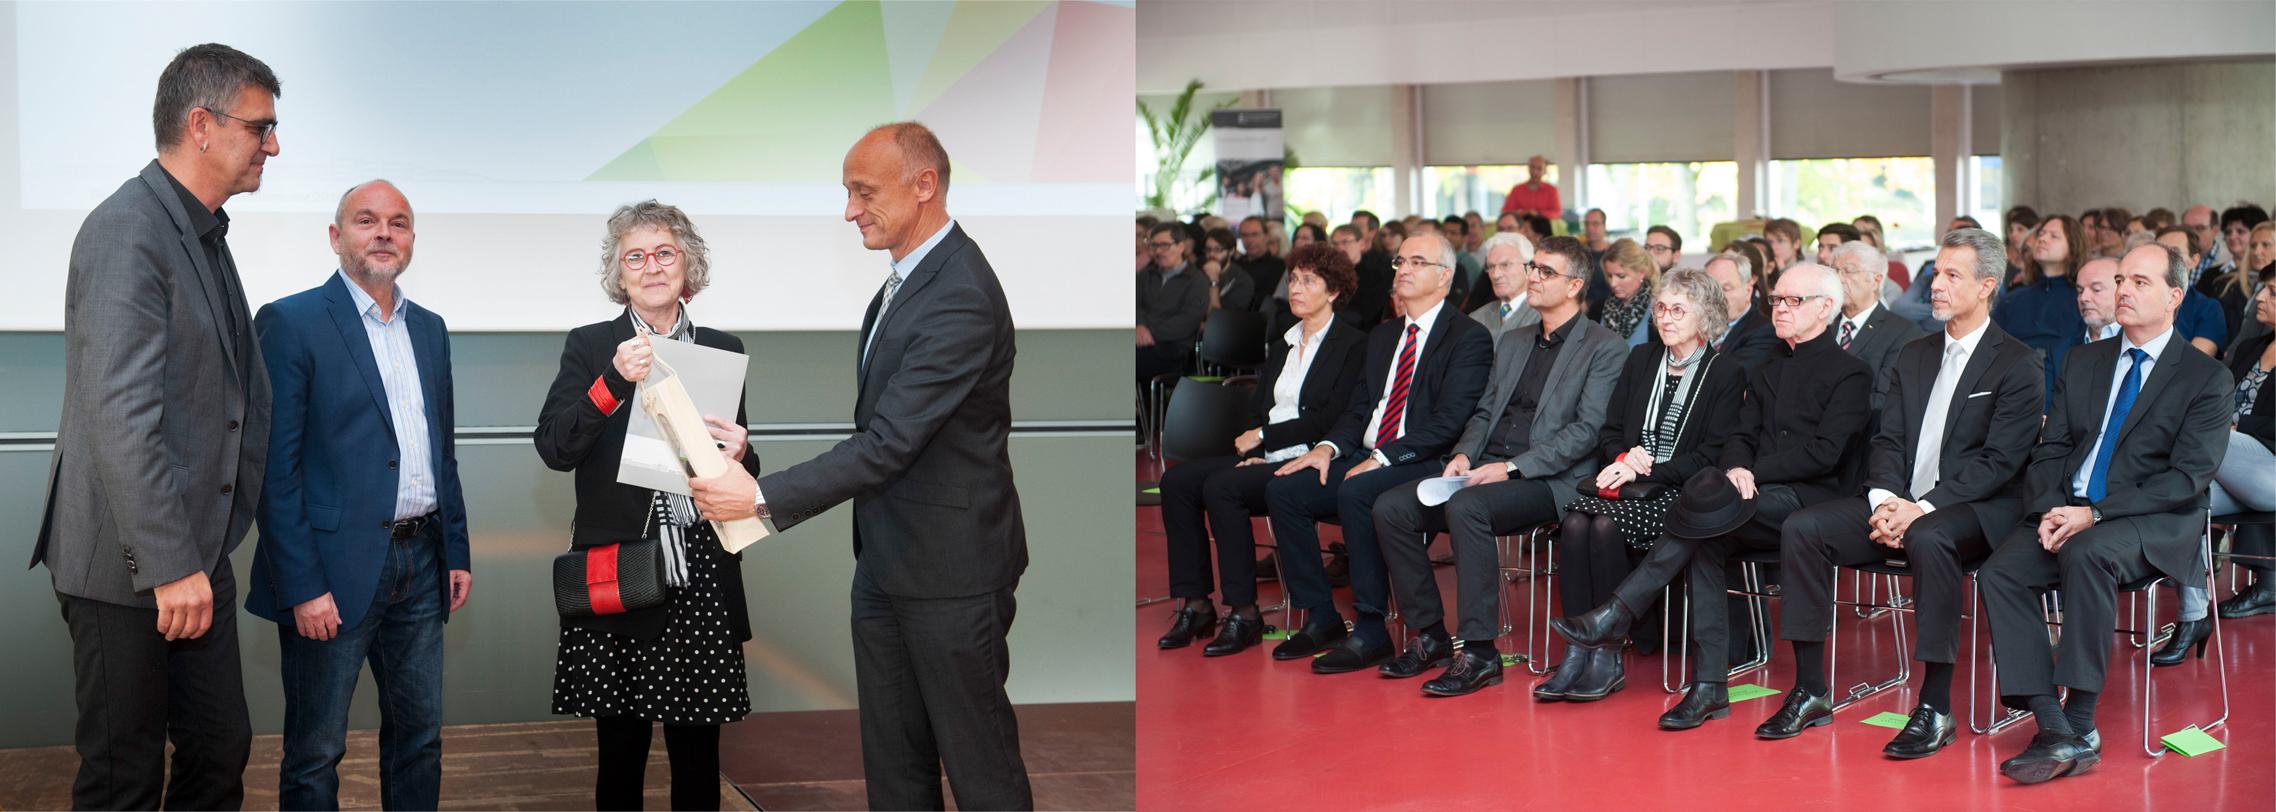 Dr Maggie McCormick receives the award of Honorary Professor at Reutlingen University. Photo credit: Karls Scheuring, Reutlingen/Germany.